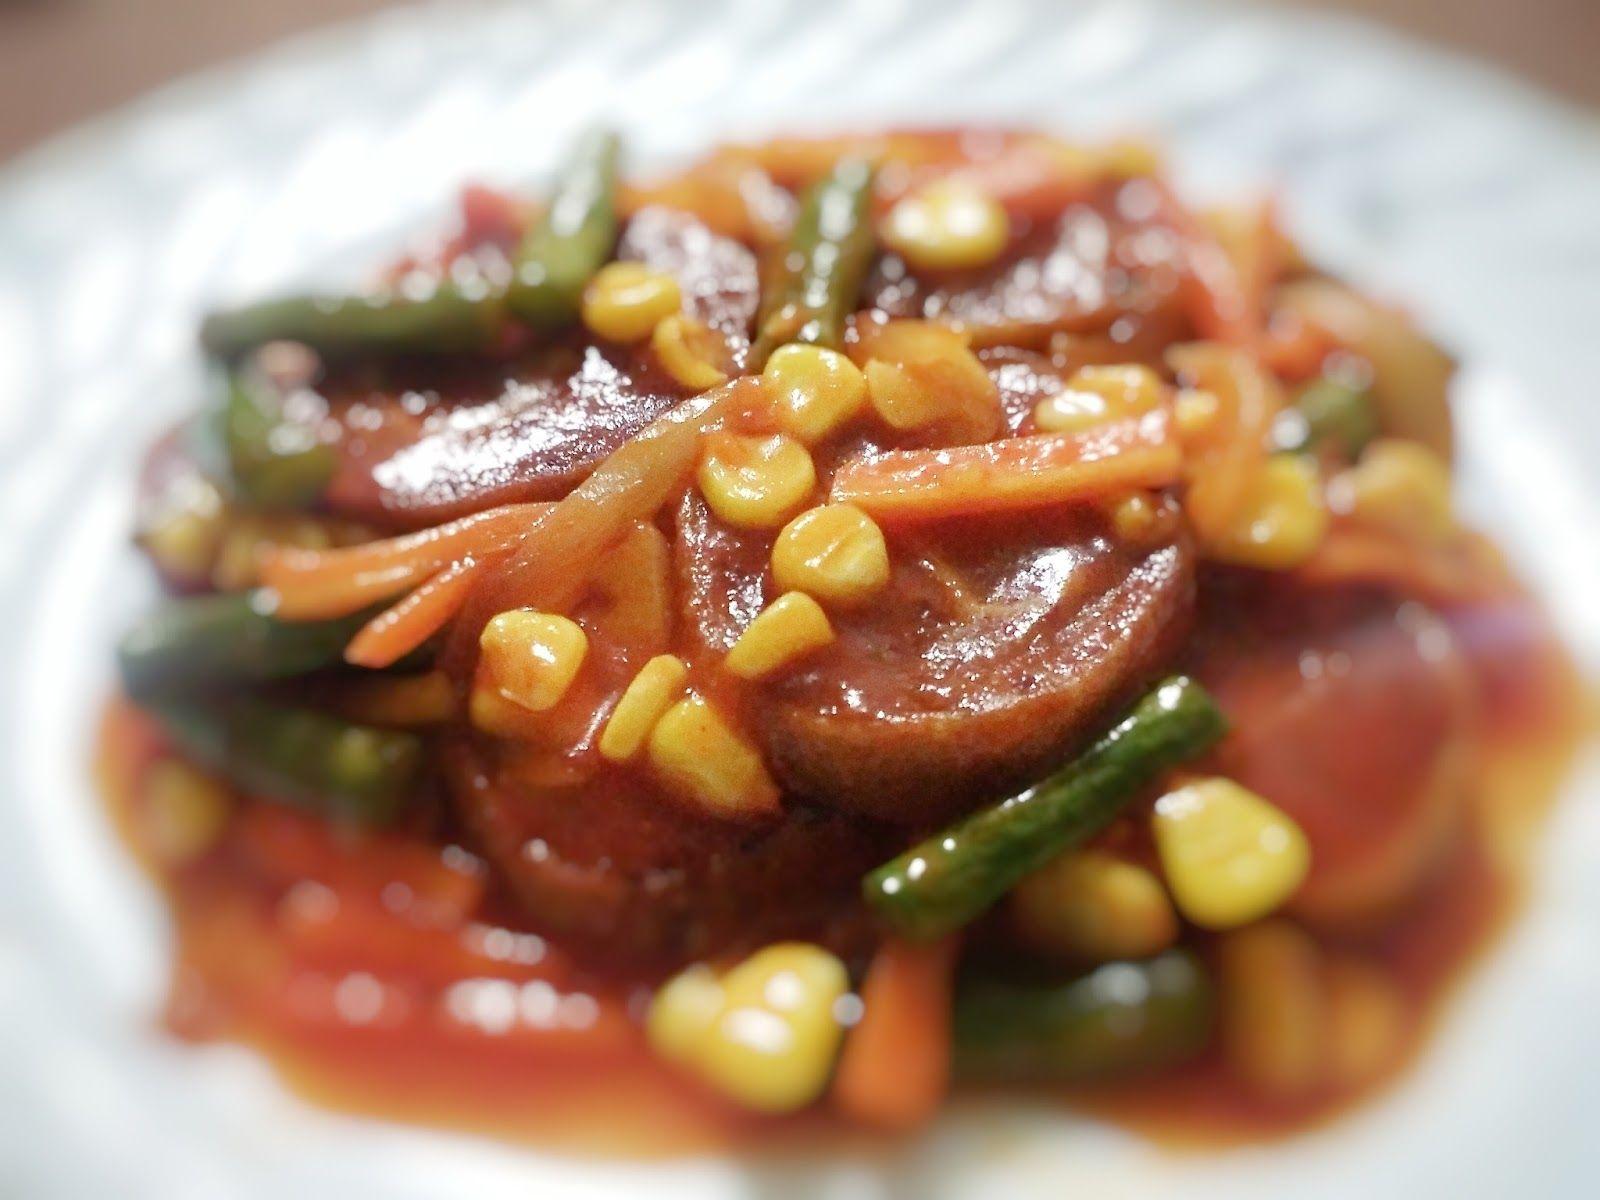 Resep Rolade Daging Sapi Saus Asam Manis Makan Malam Masakan Resep Makanan